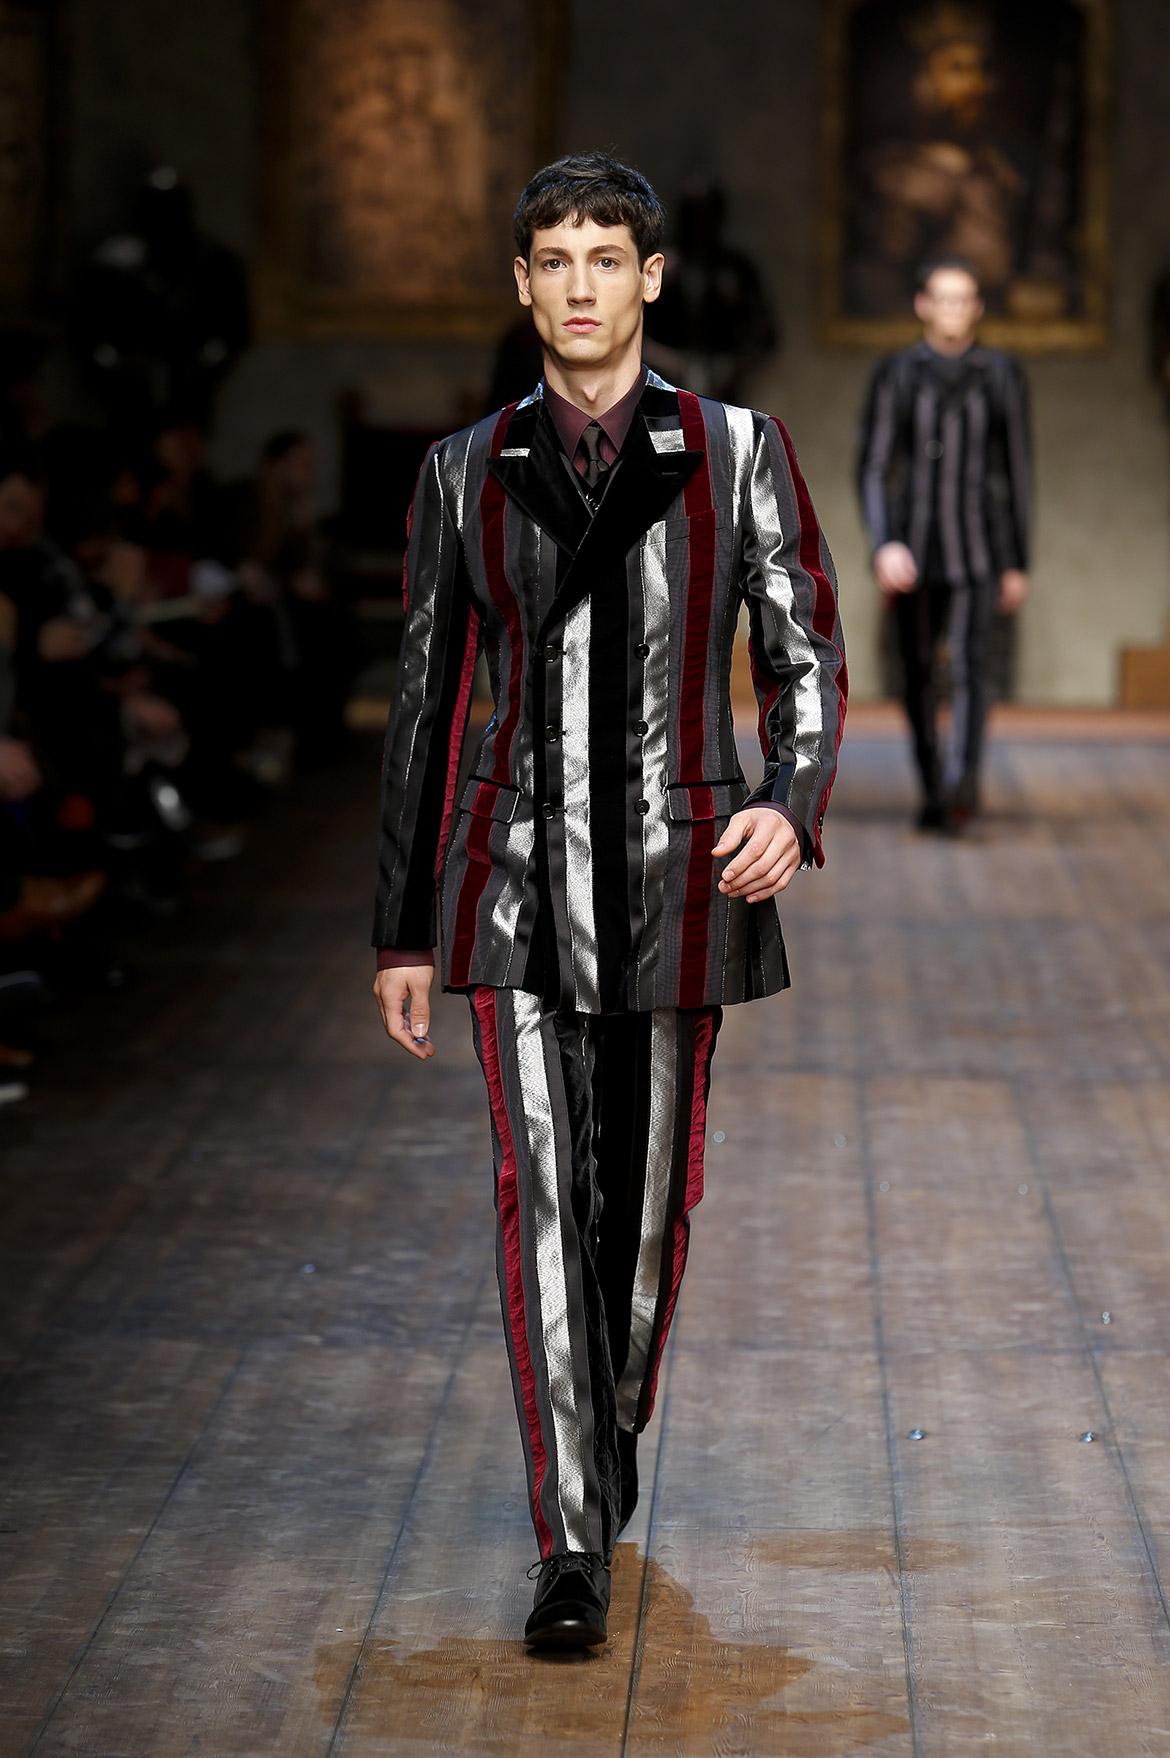 Dolce And Gabbana Fw 2014 2015 Men Fashion Show Runway 65 The Pop Culture Rainman